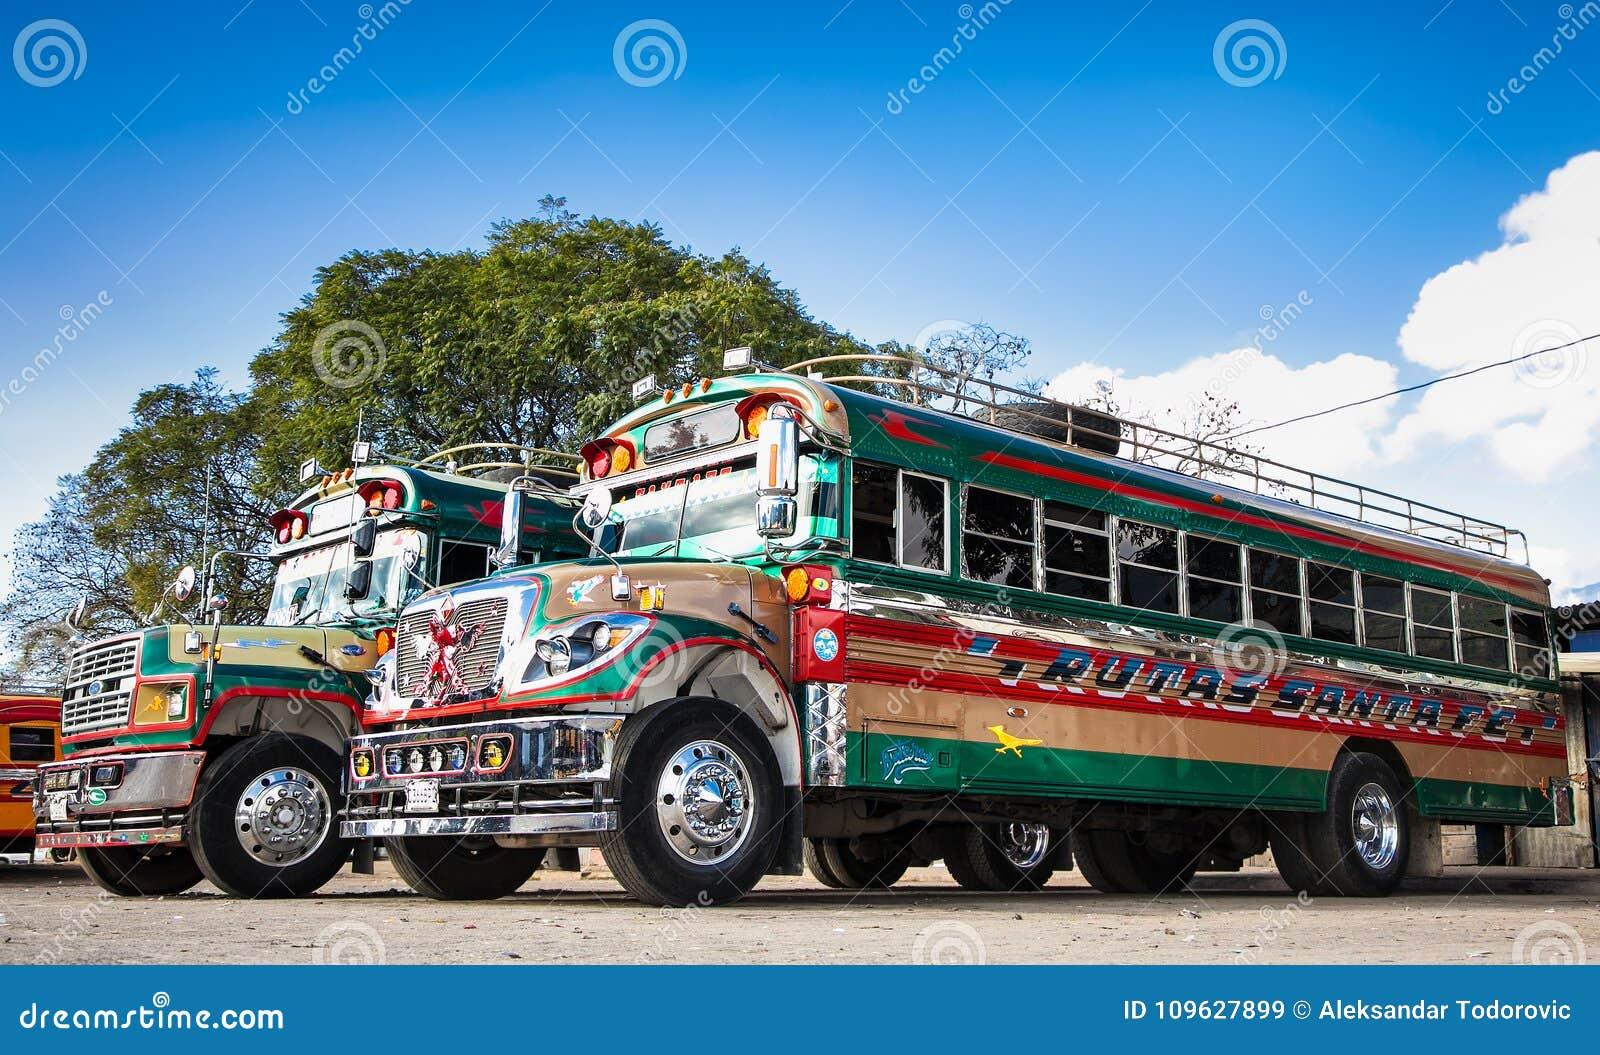 Typical Guatemalan Chicken Bus In Antigua, Guatemala